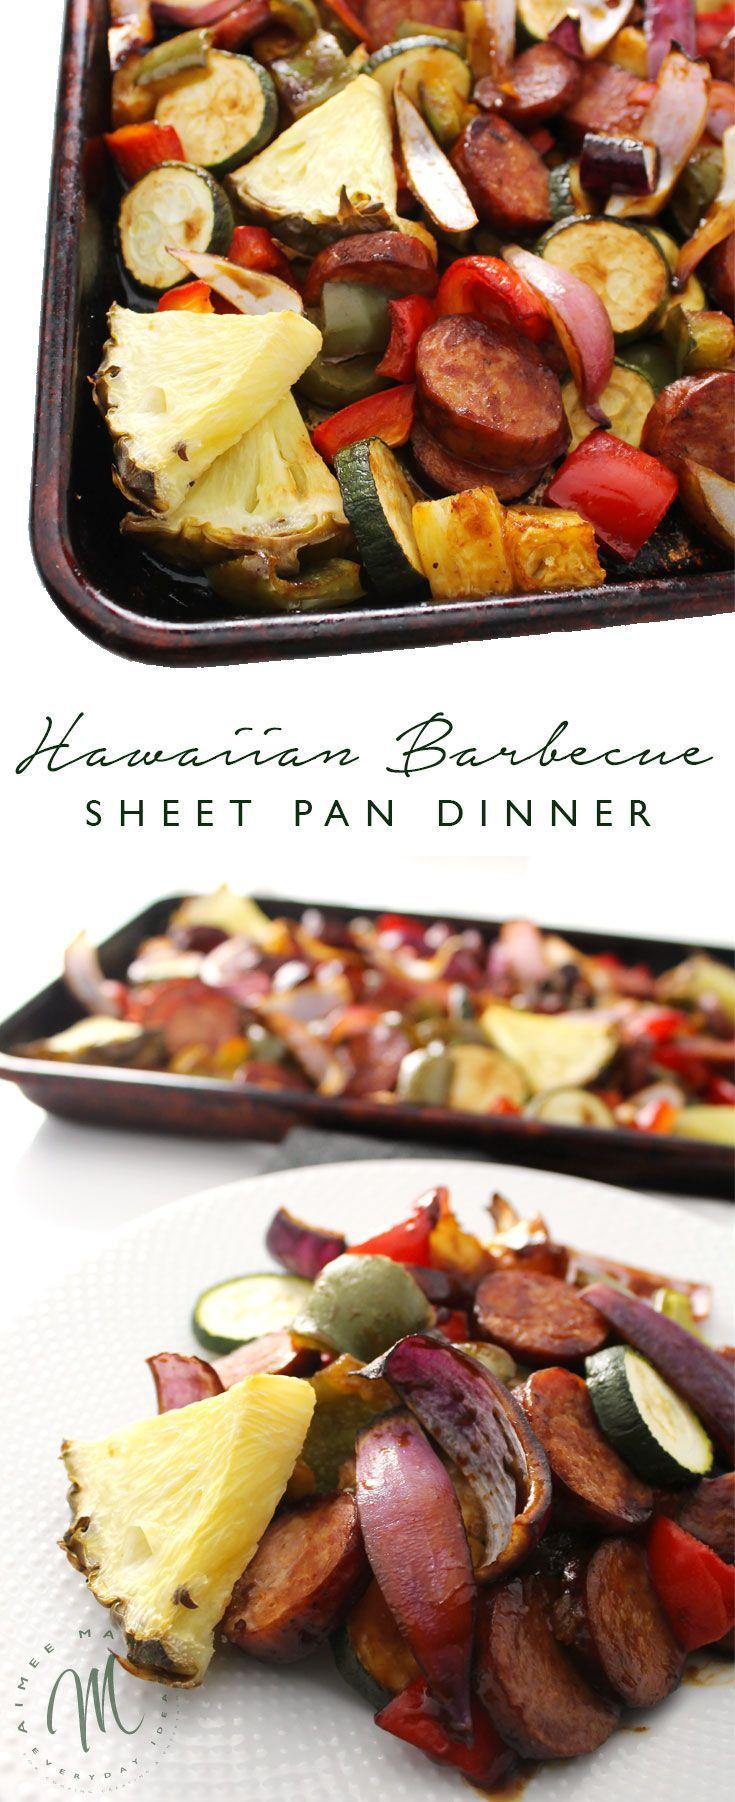 Hawaiian Barbecue Sheet Pan Dinner